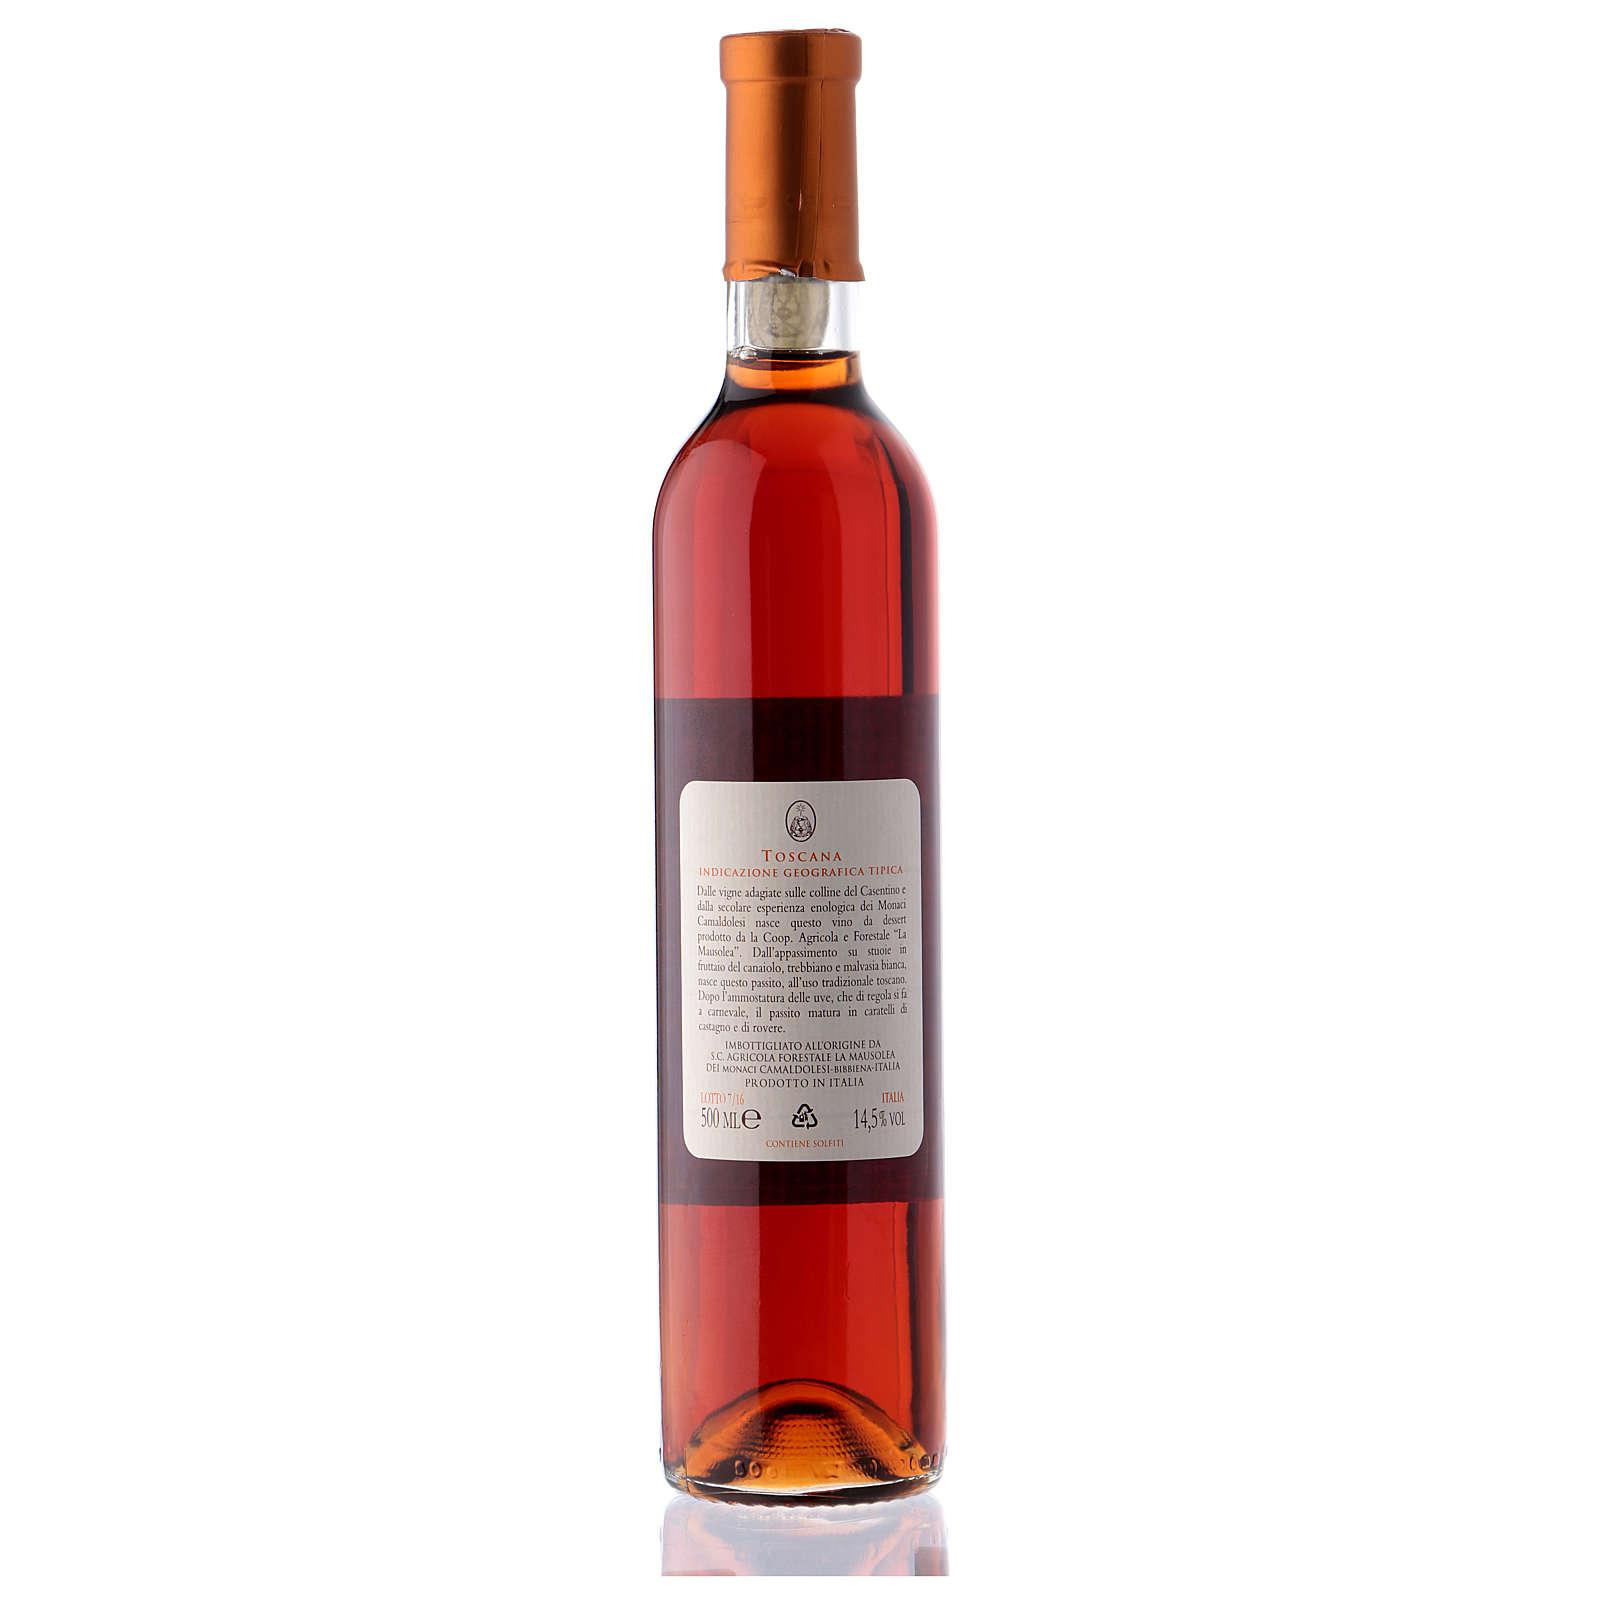 Vinho passito toscano Borbotto 500 ml 3